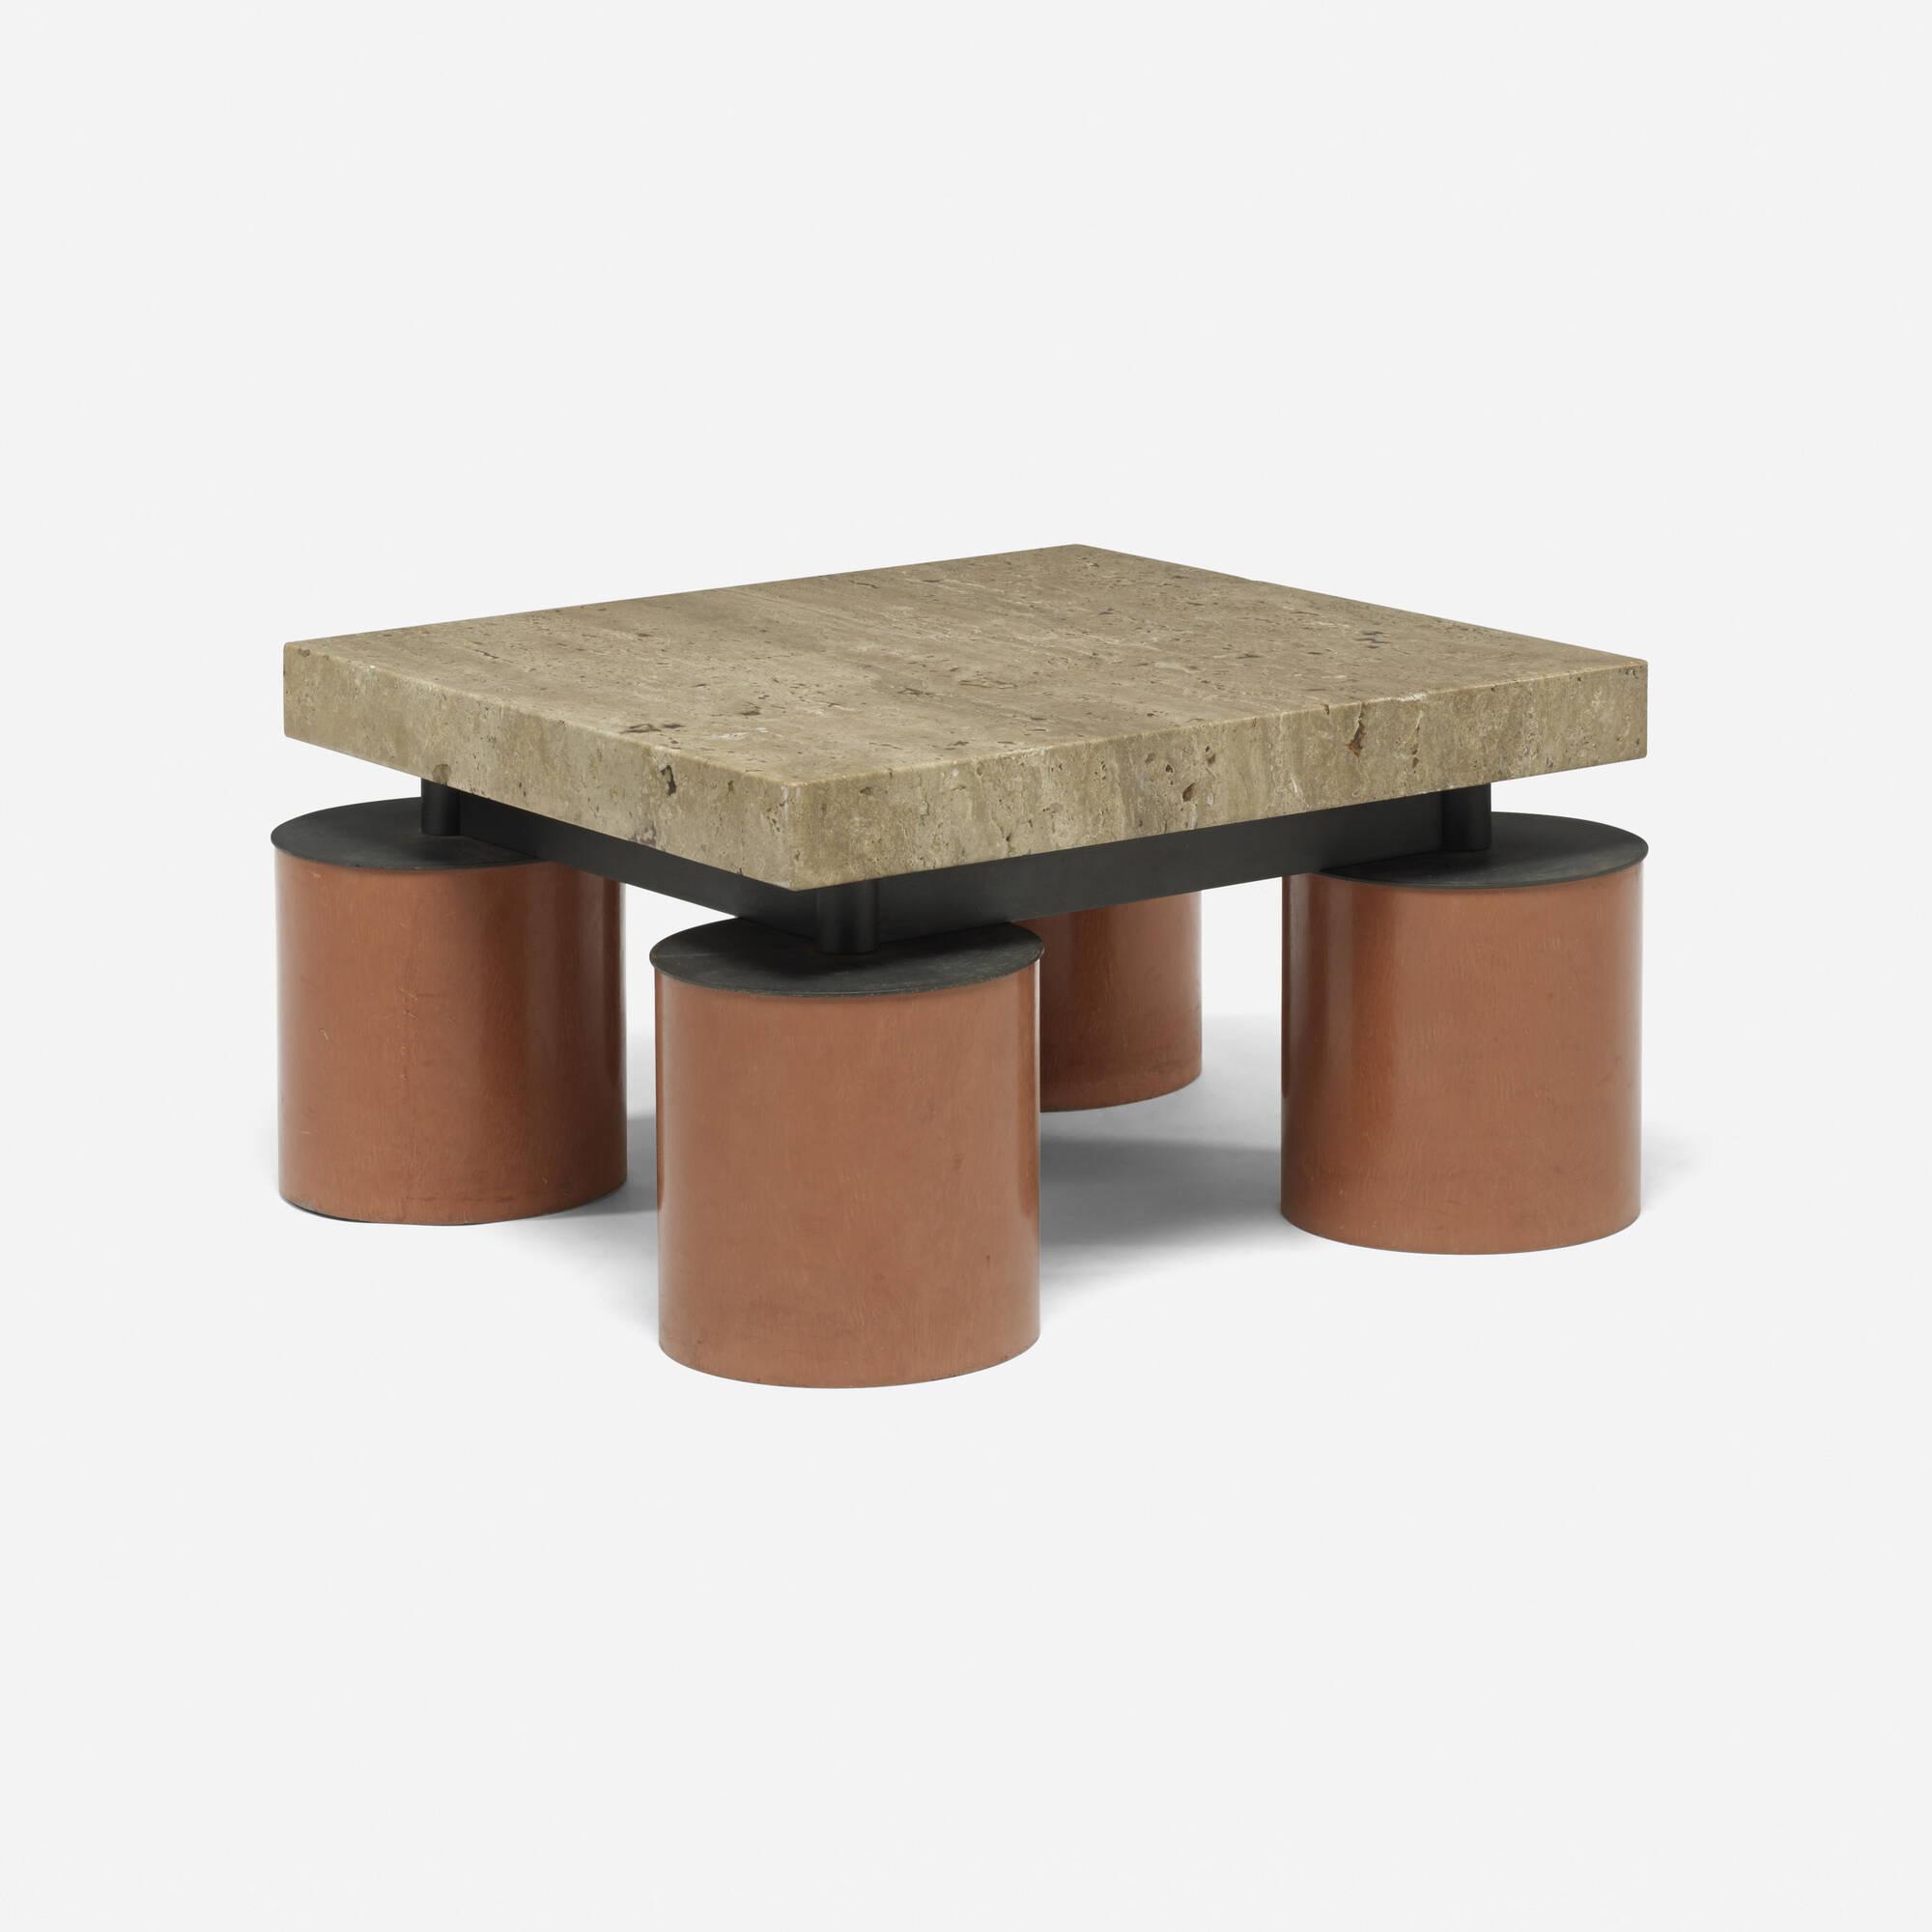 303: Massimo Vignelli / custom coffee table (1 of 3)